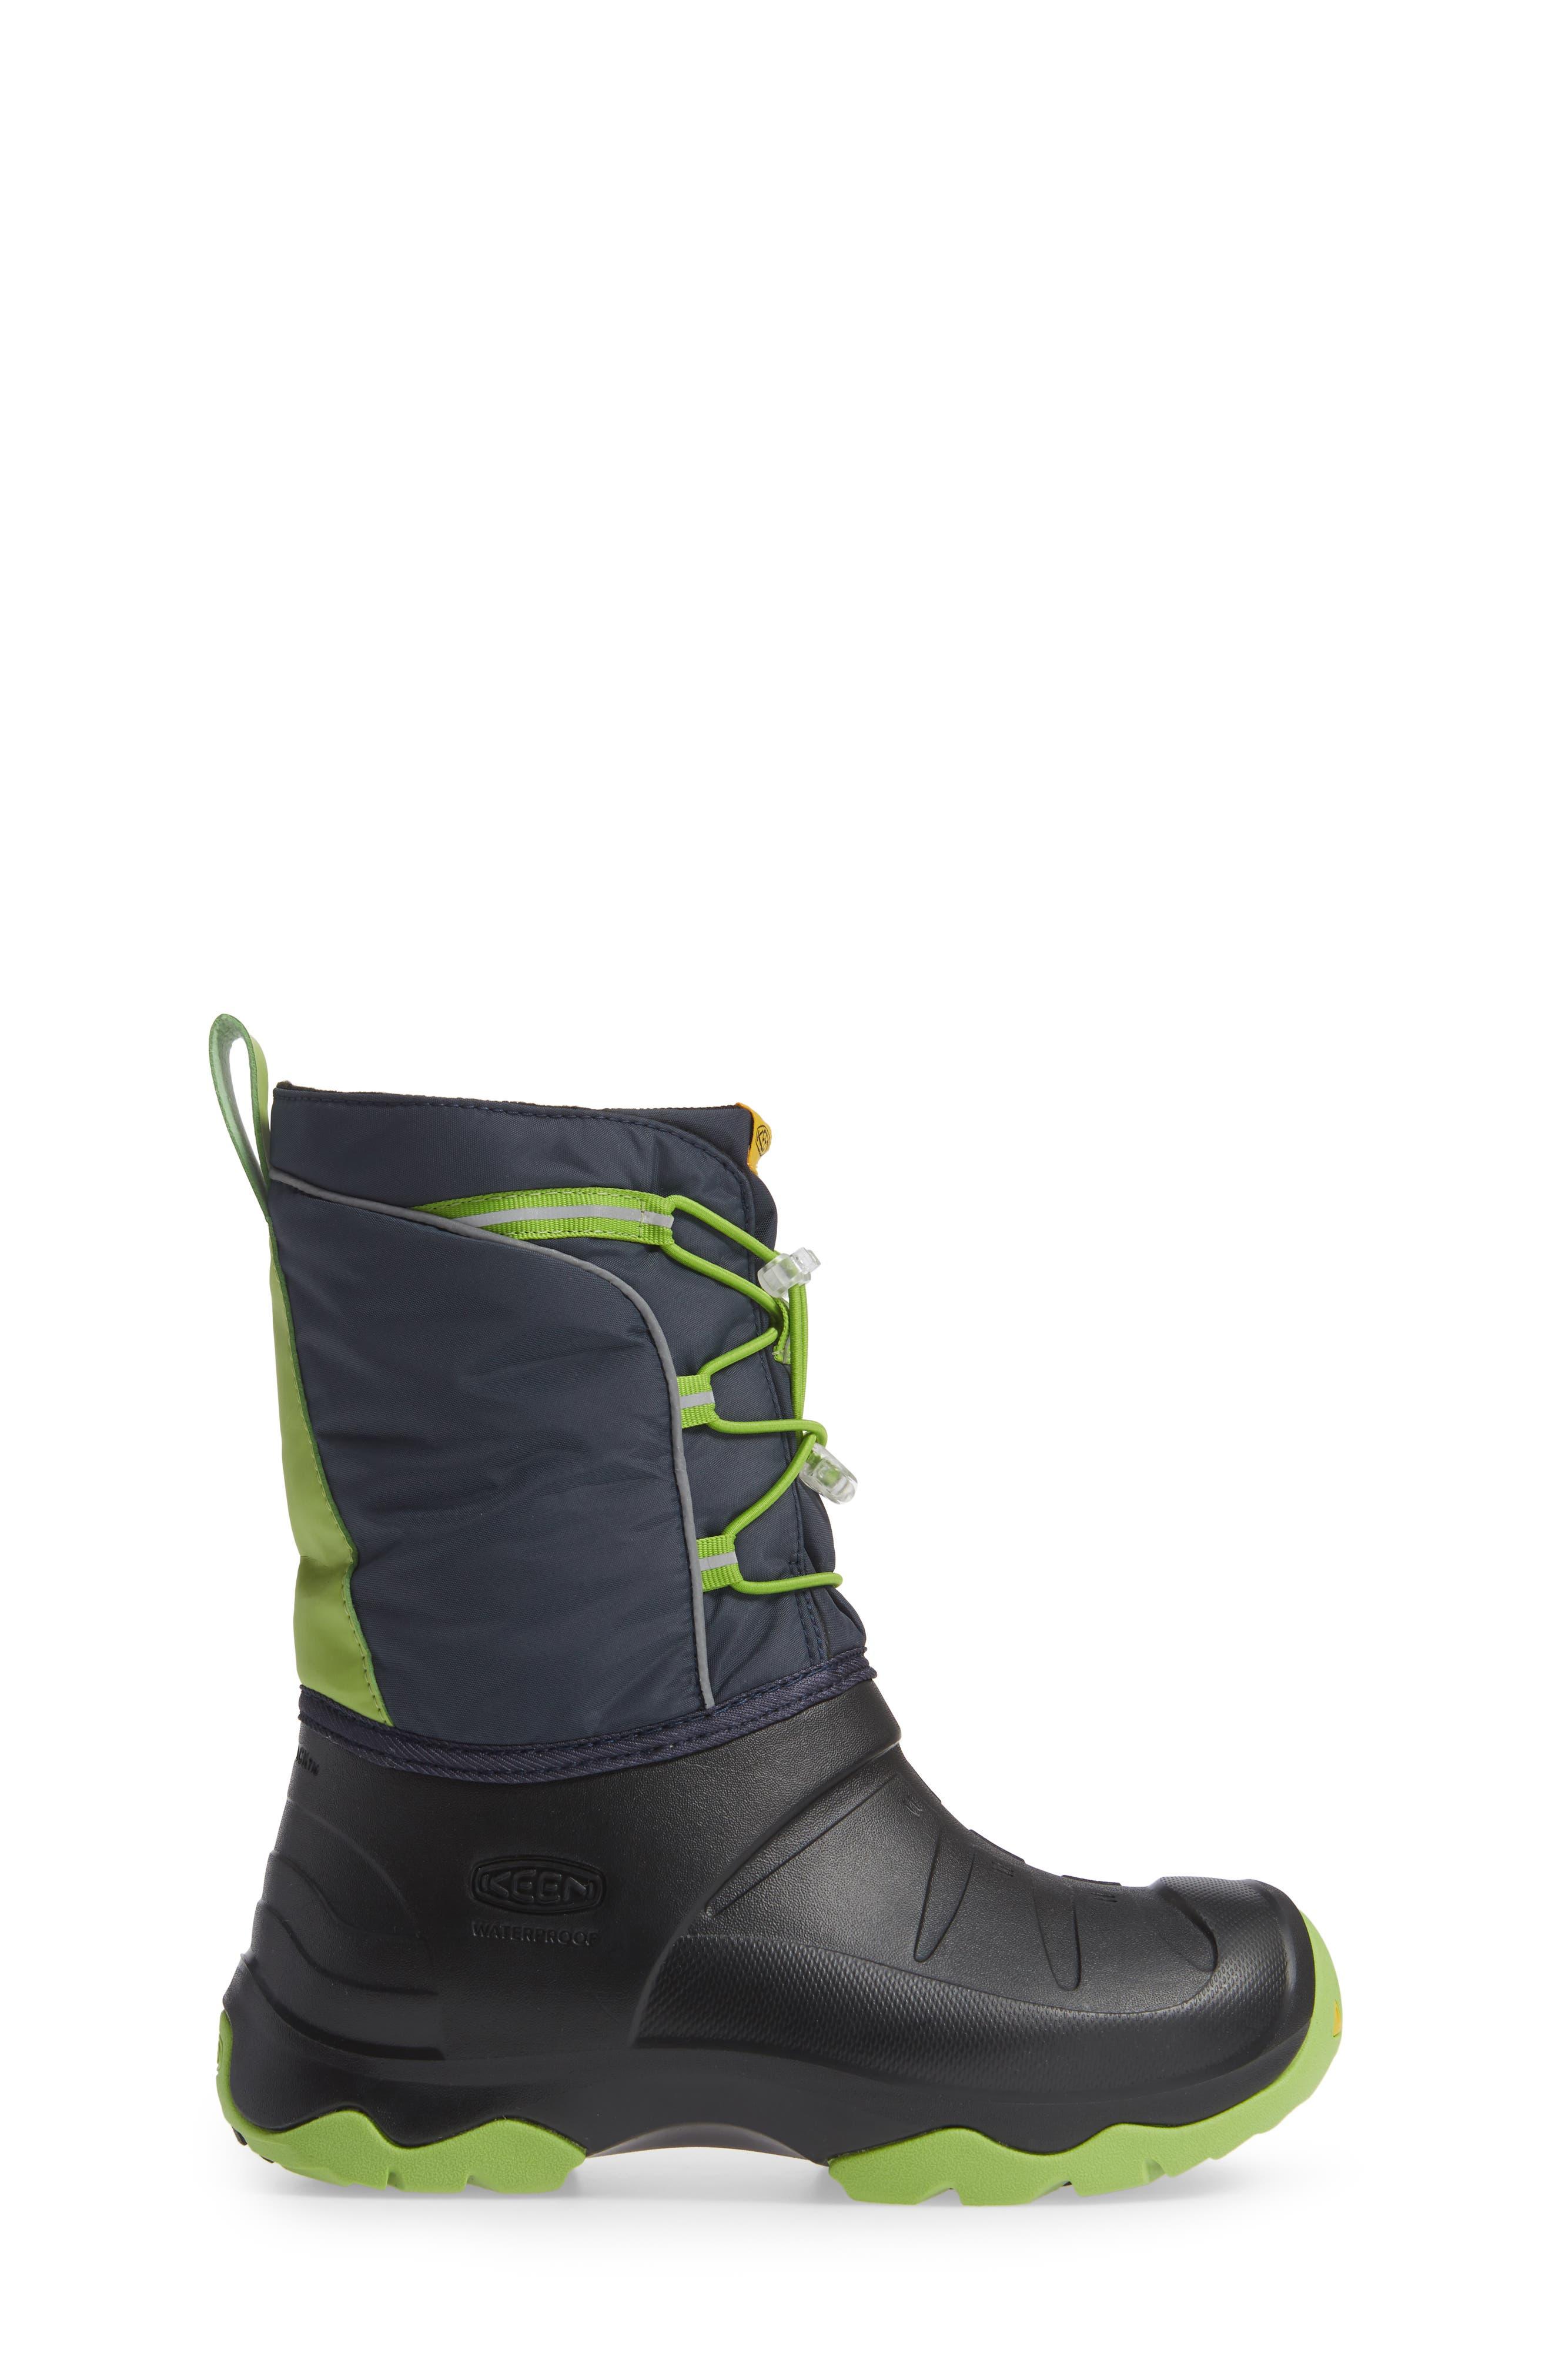 KEEN, Lumi Waterproof Boot, Alternate thumbnail 3, color, BLUE/ GREENERY